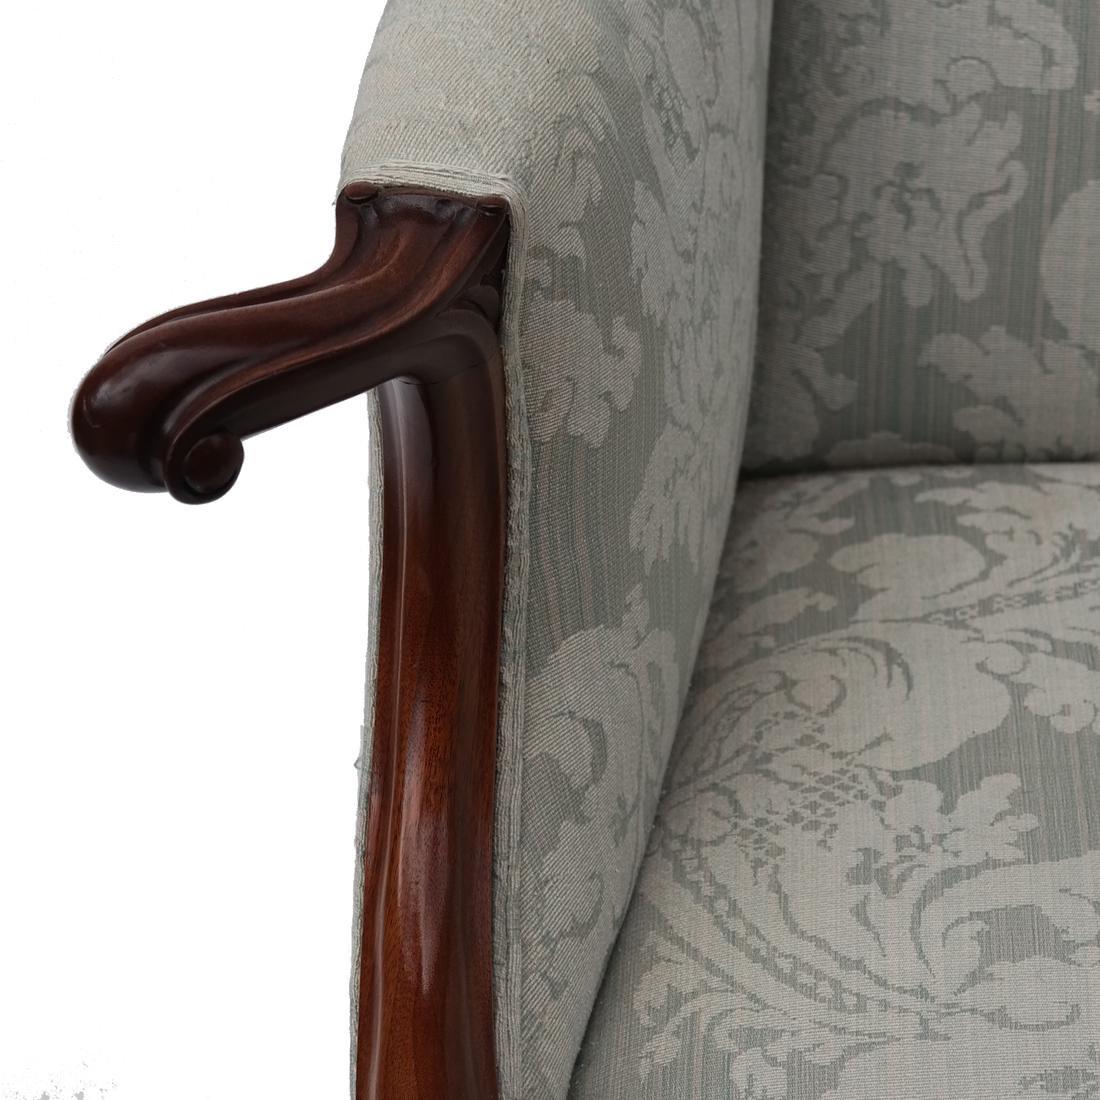 Irish Ball & Claw Wing Chair 19th Century - 2